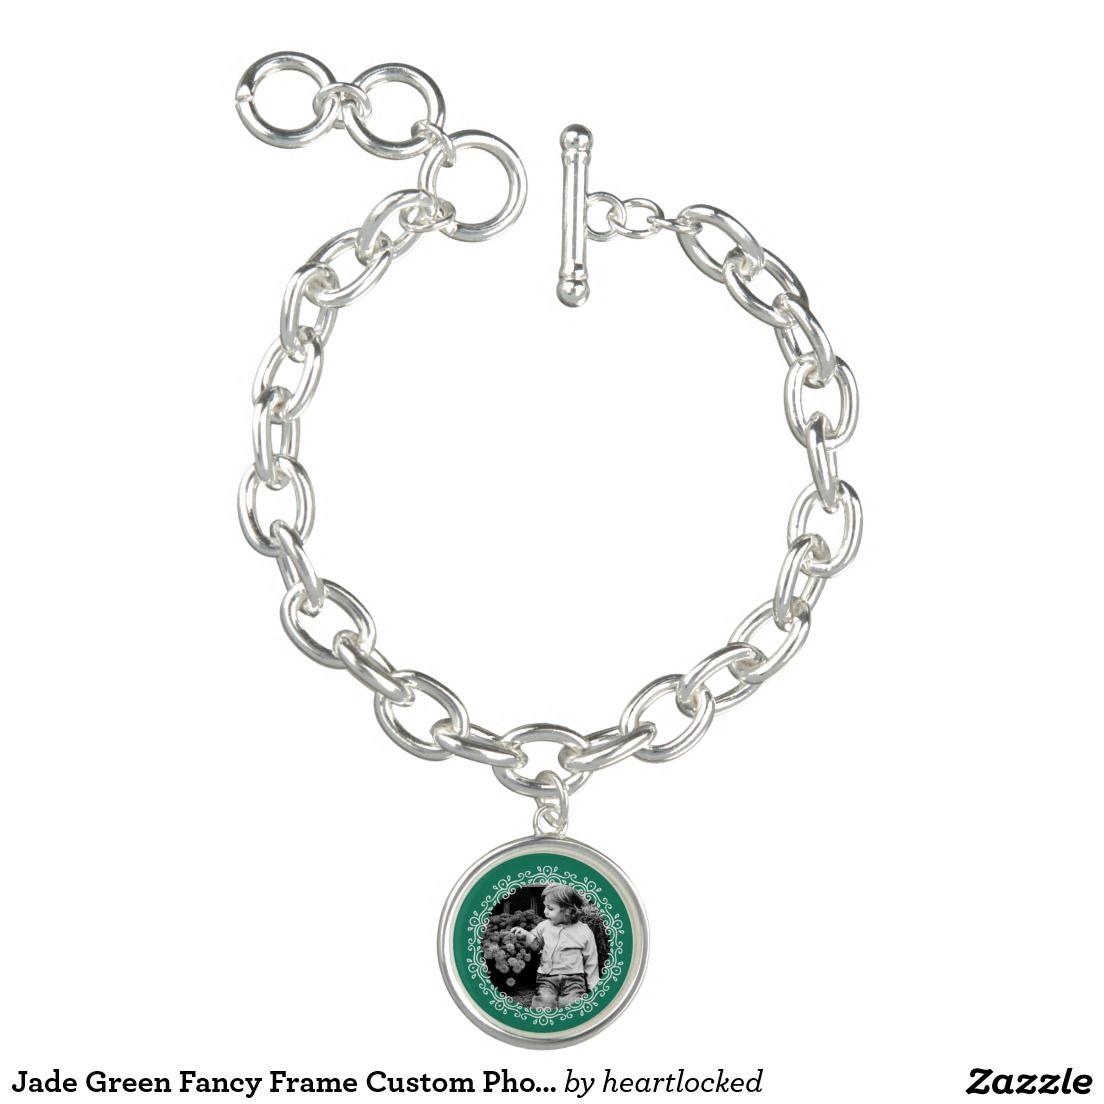 Jade Green Fancy Frame Custom Photo Charm Bracelet | Green with Envy ...